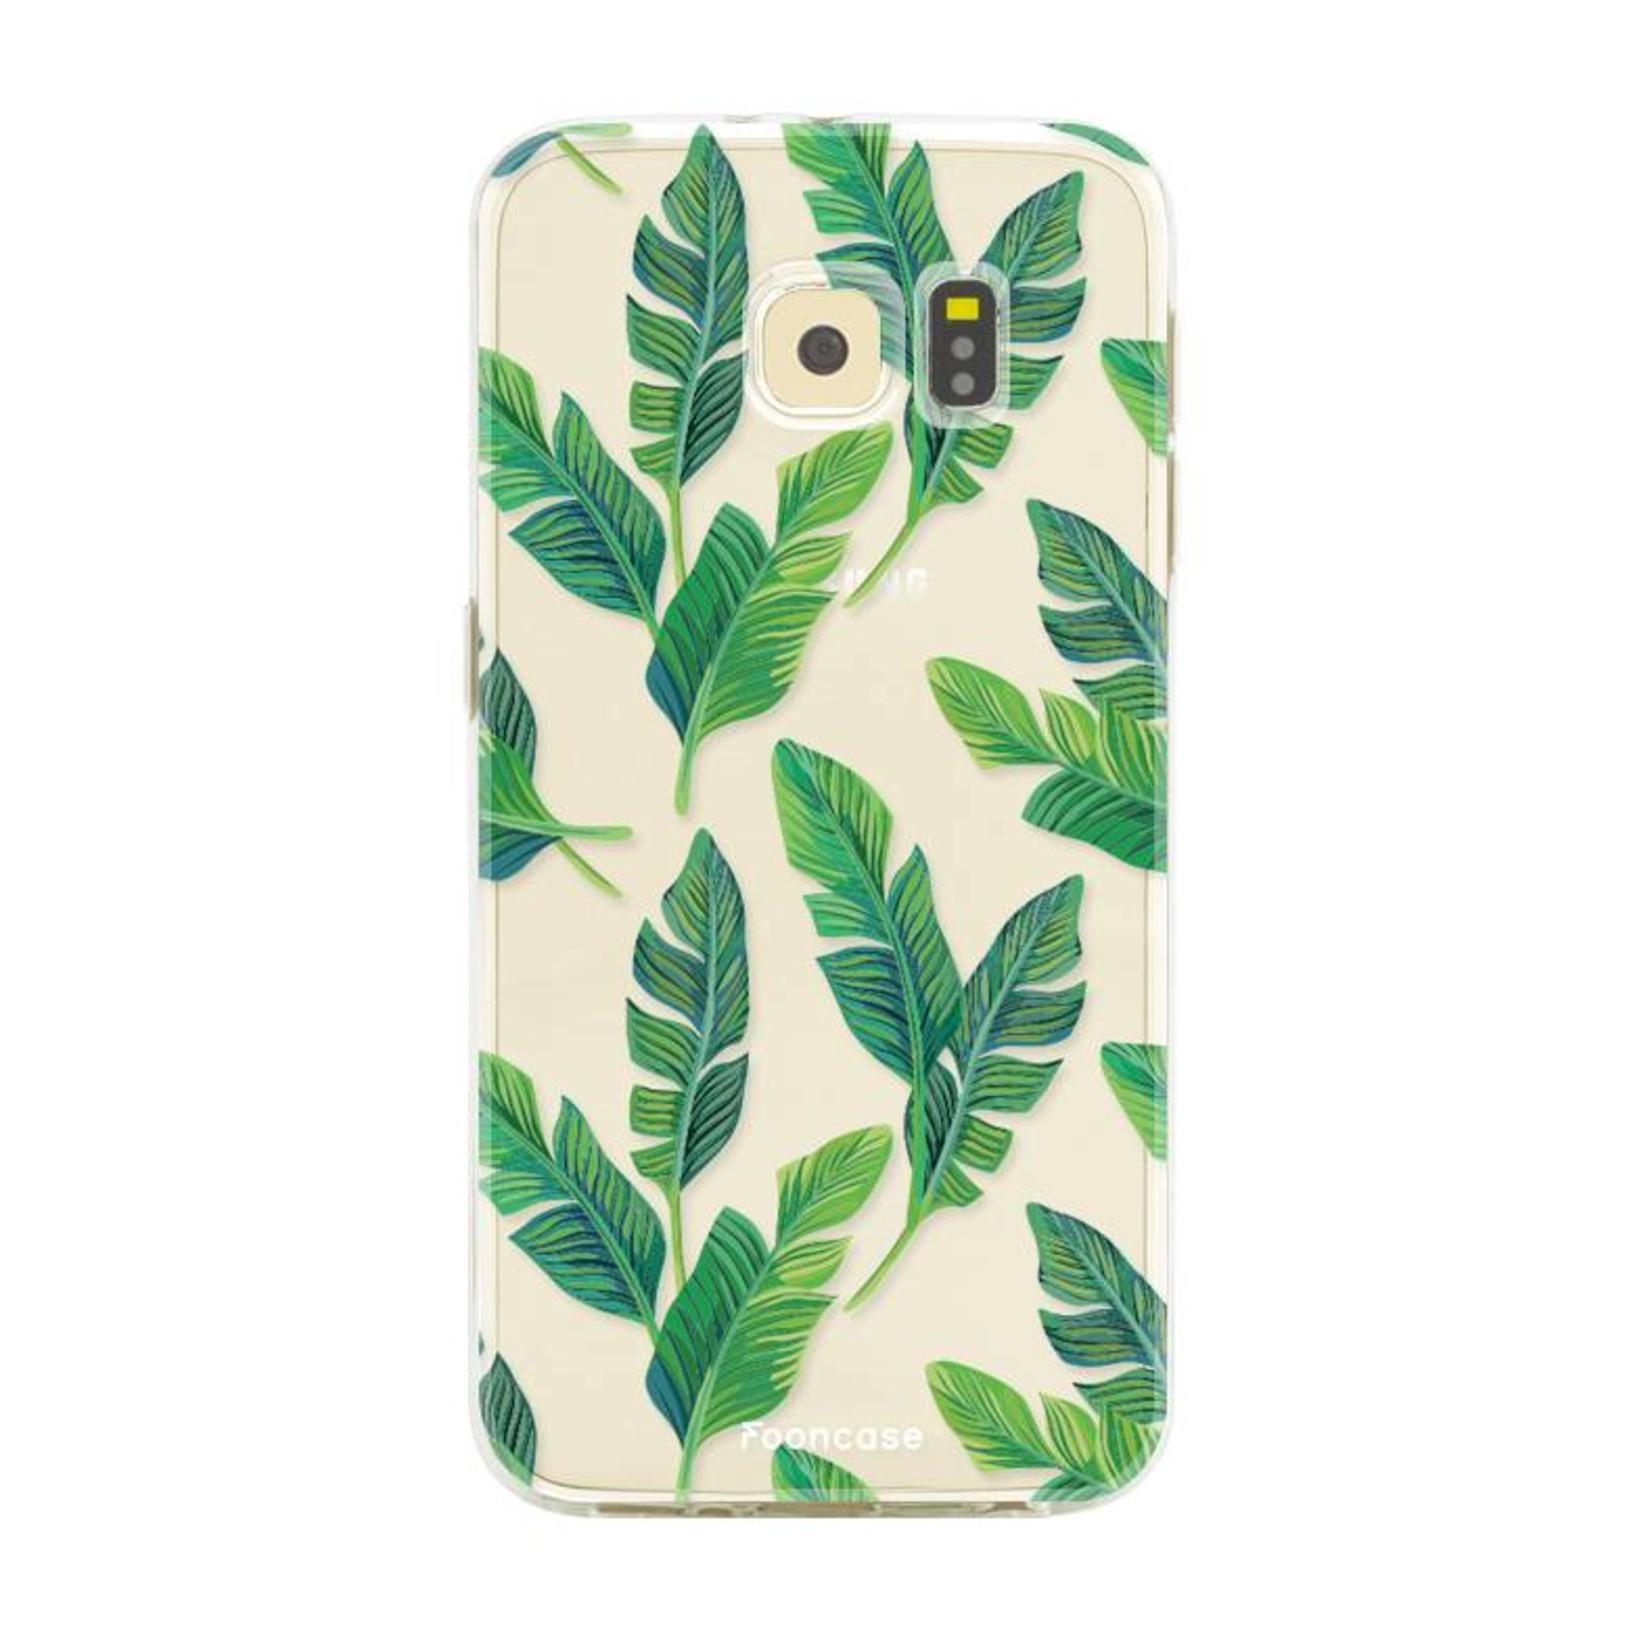 FOONCASE Samsung Galaxy S6 Handyhülle - Bananenblätter